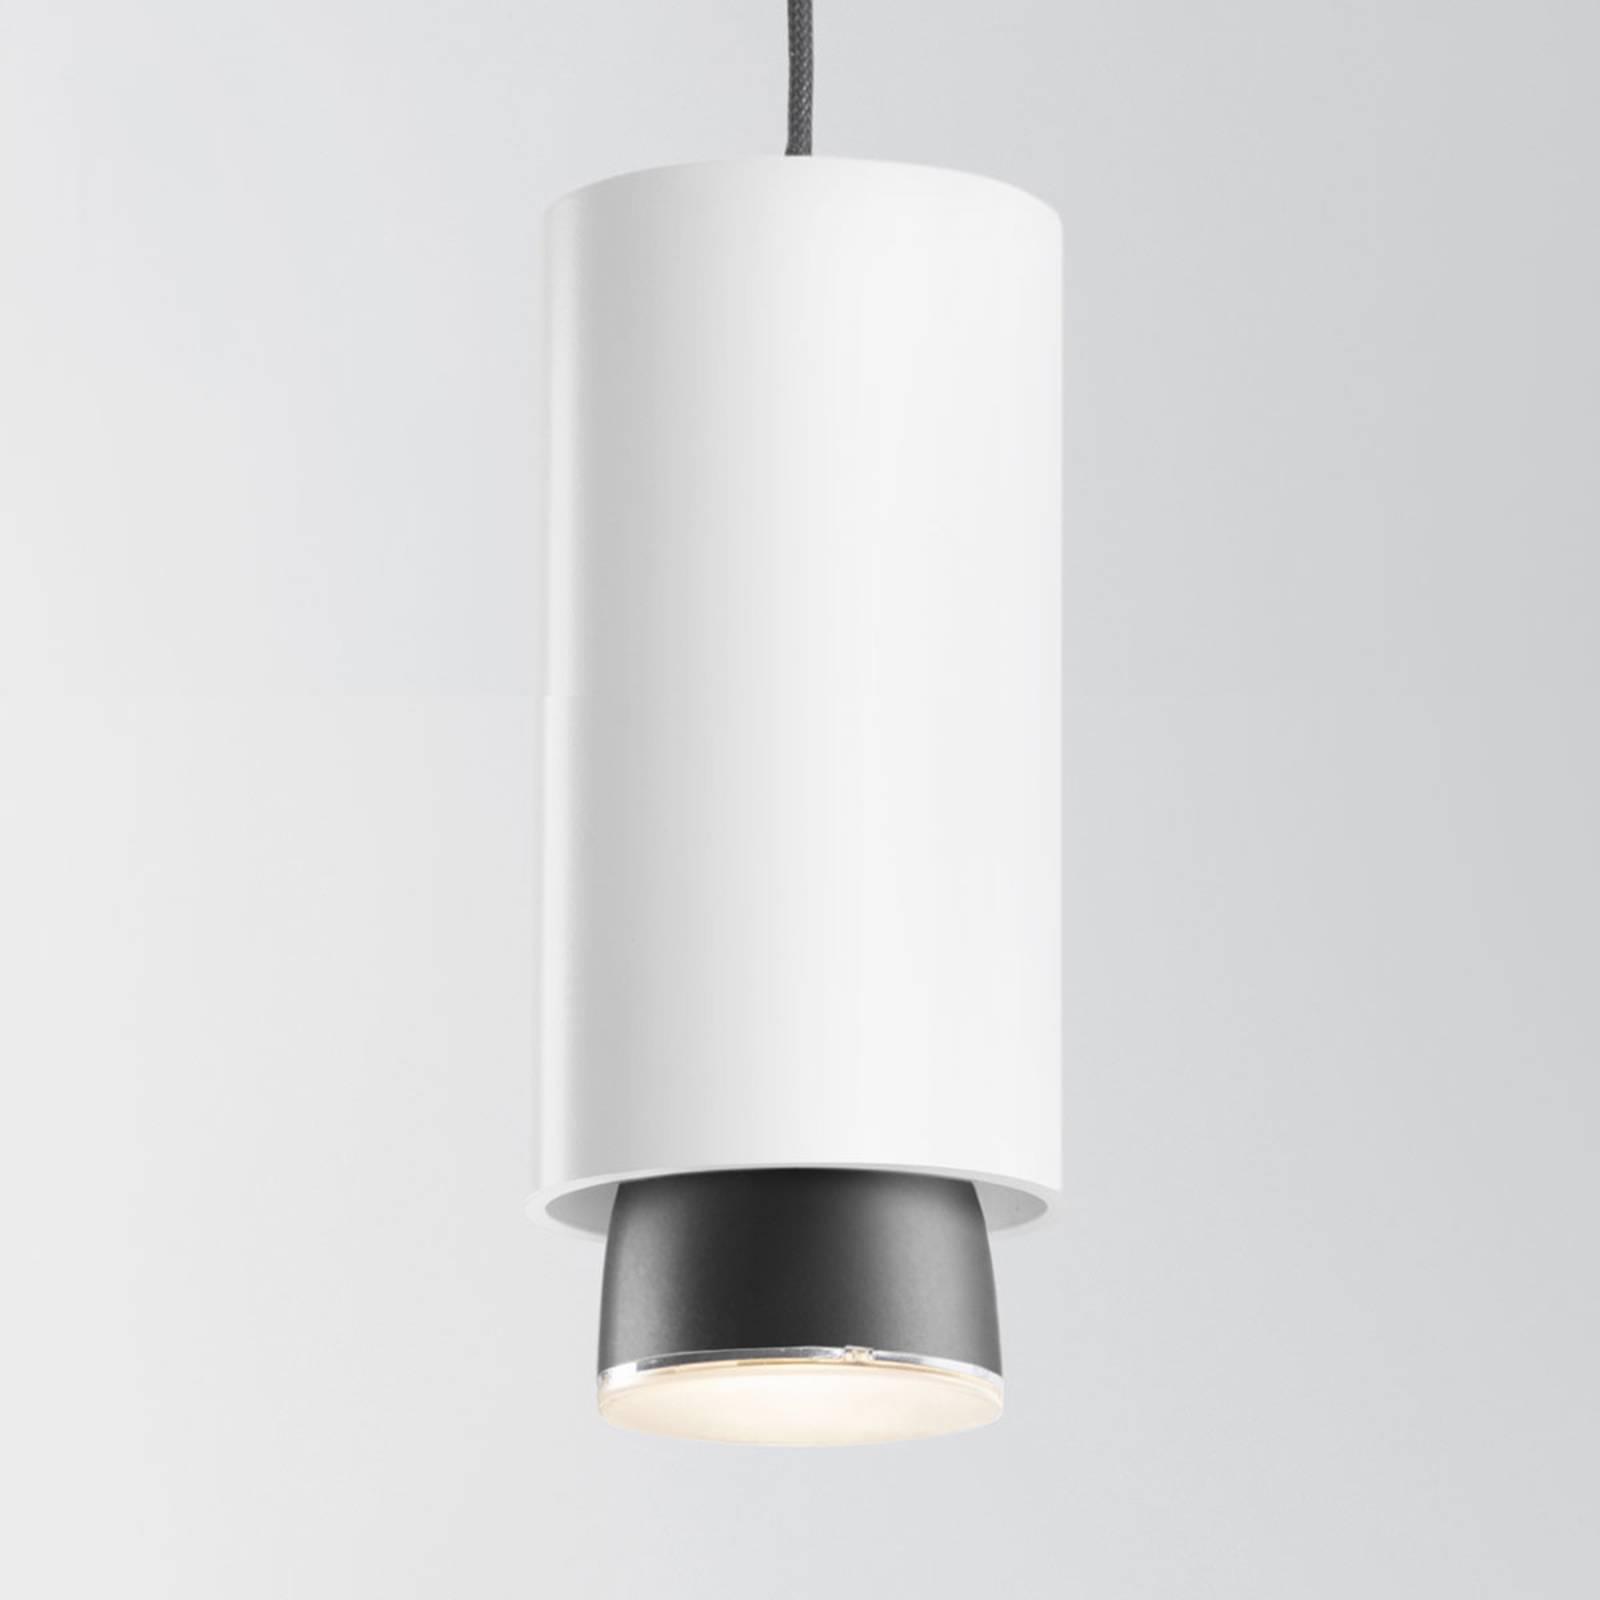 Fabbian Claque suspension LED 20cm blanc